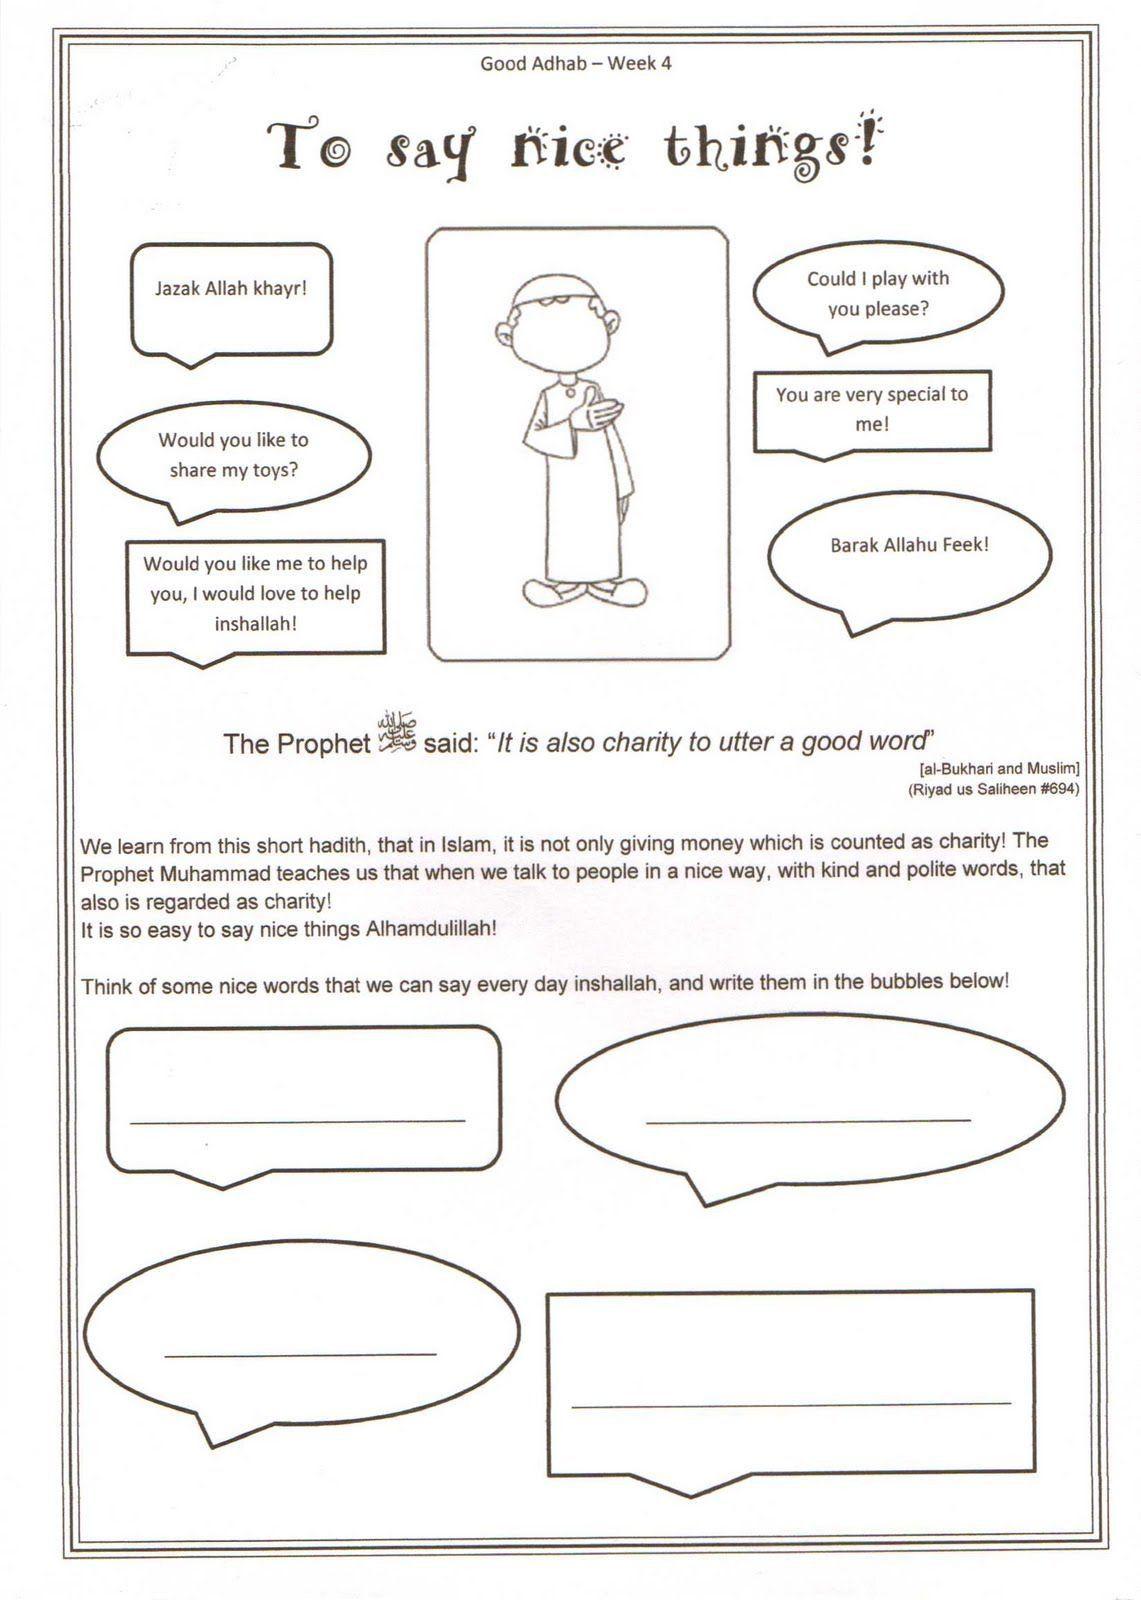 Islamic Studies Worksheets For Kindergarten Worksheet For Kindergarten Kindergarten Worksheets Islamic Studies Islamic Kids Activities Islamic worksheet for kindergarten